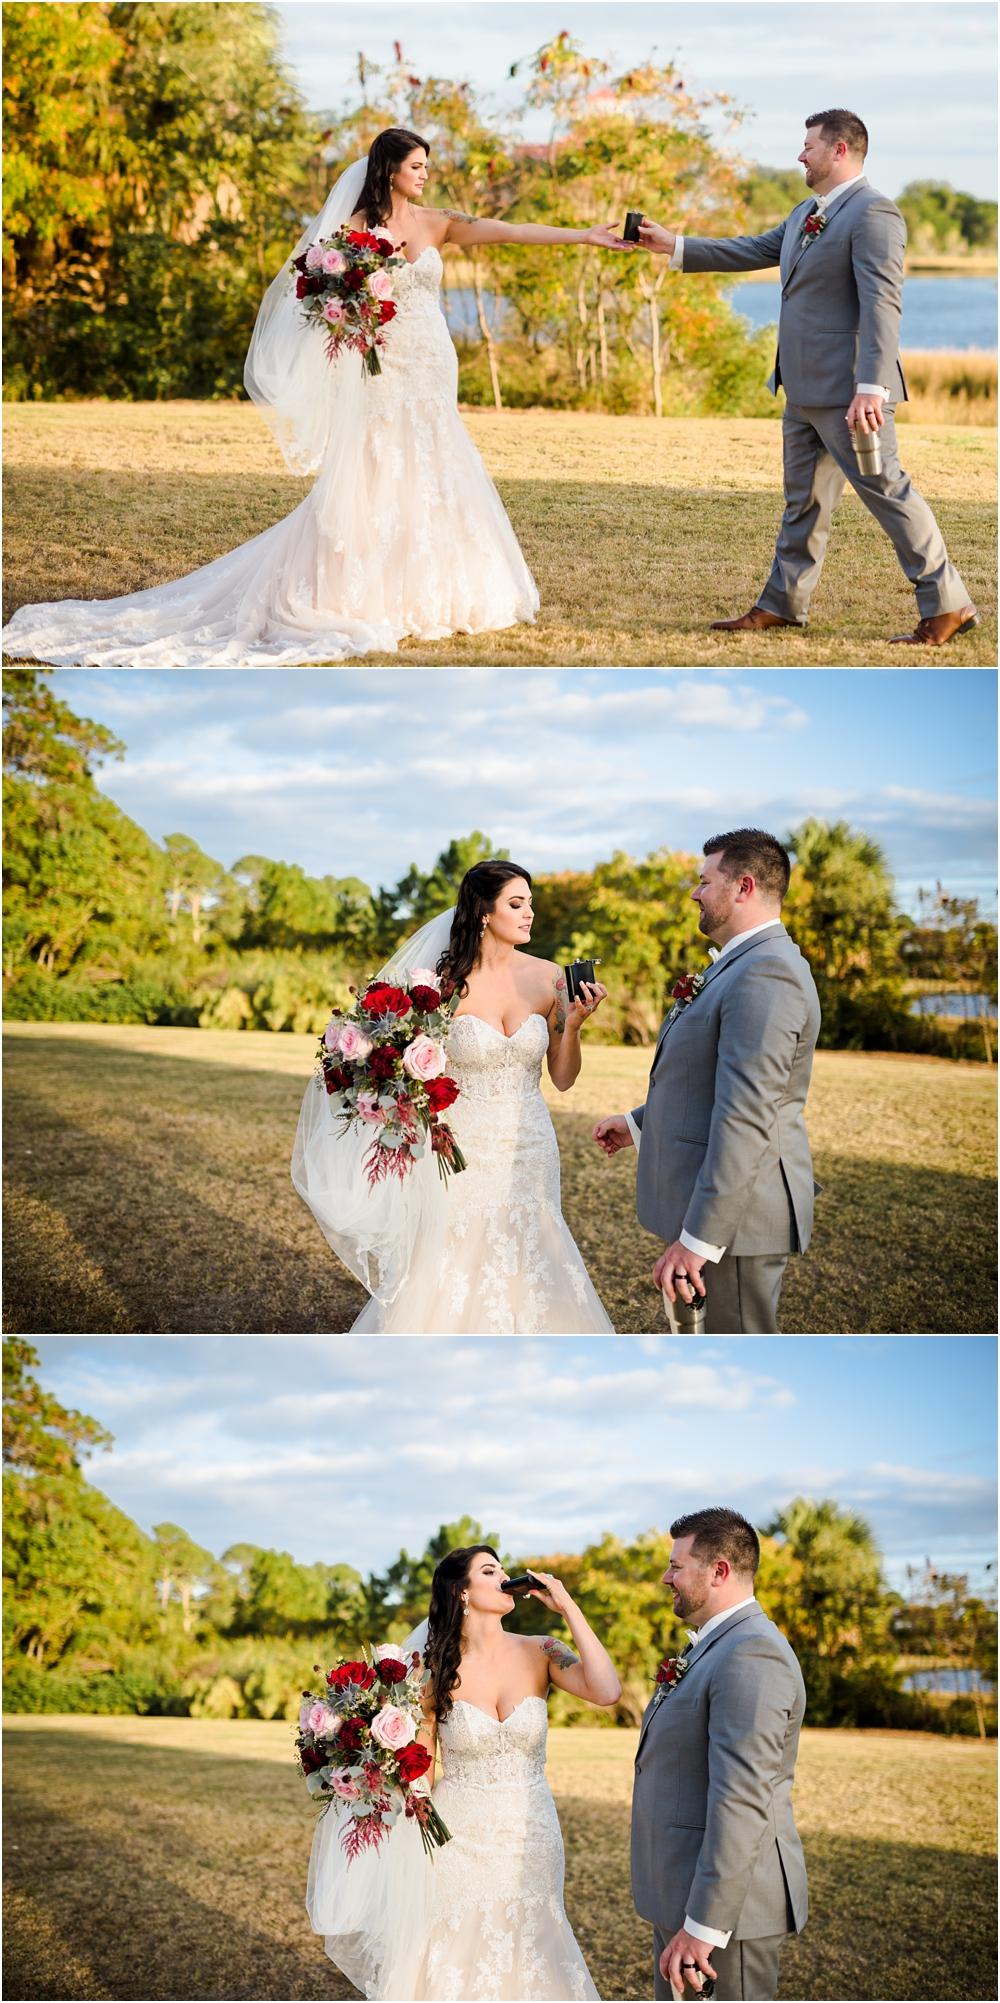 imhof-sheraton-panama-city-beach-florida-wedding-photographer-kiersten-grant-112.jpg